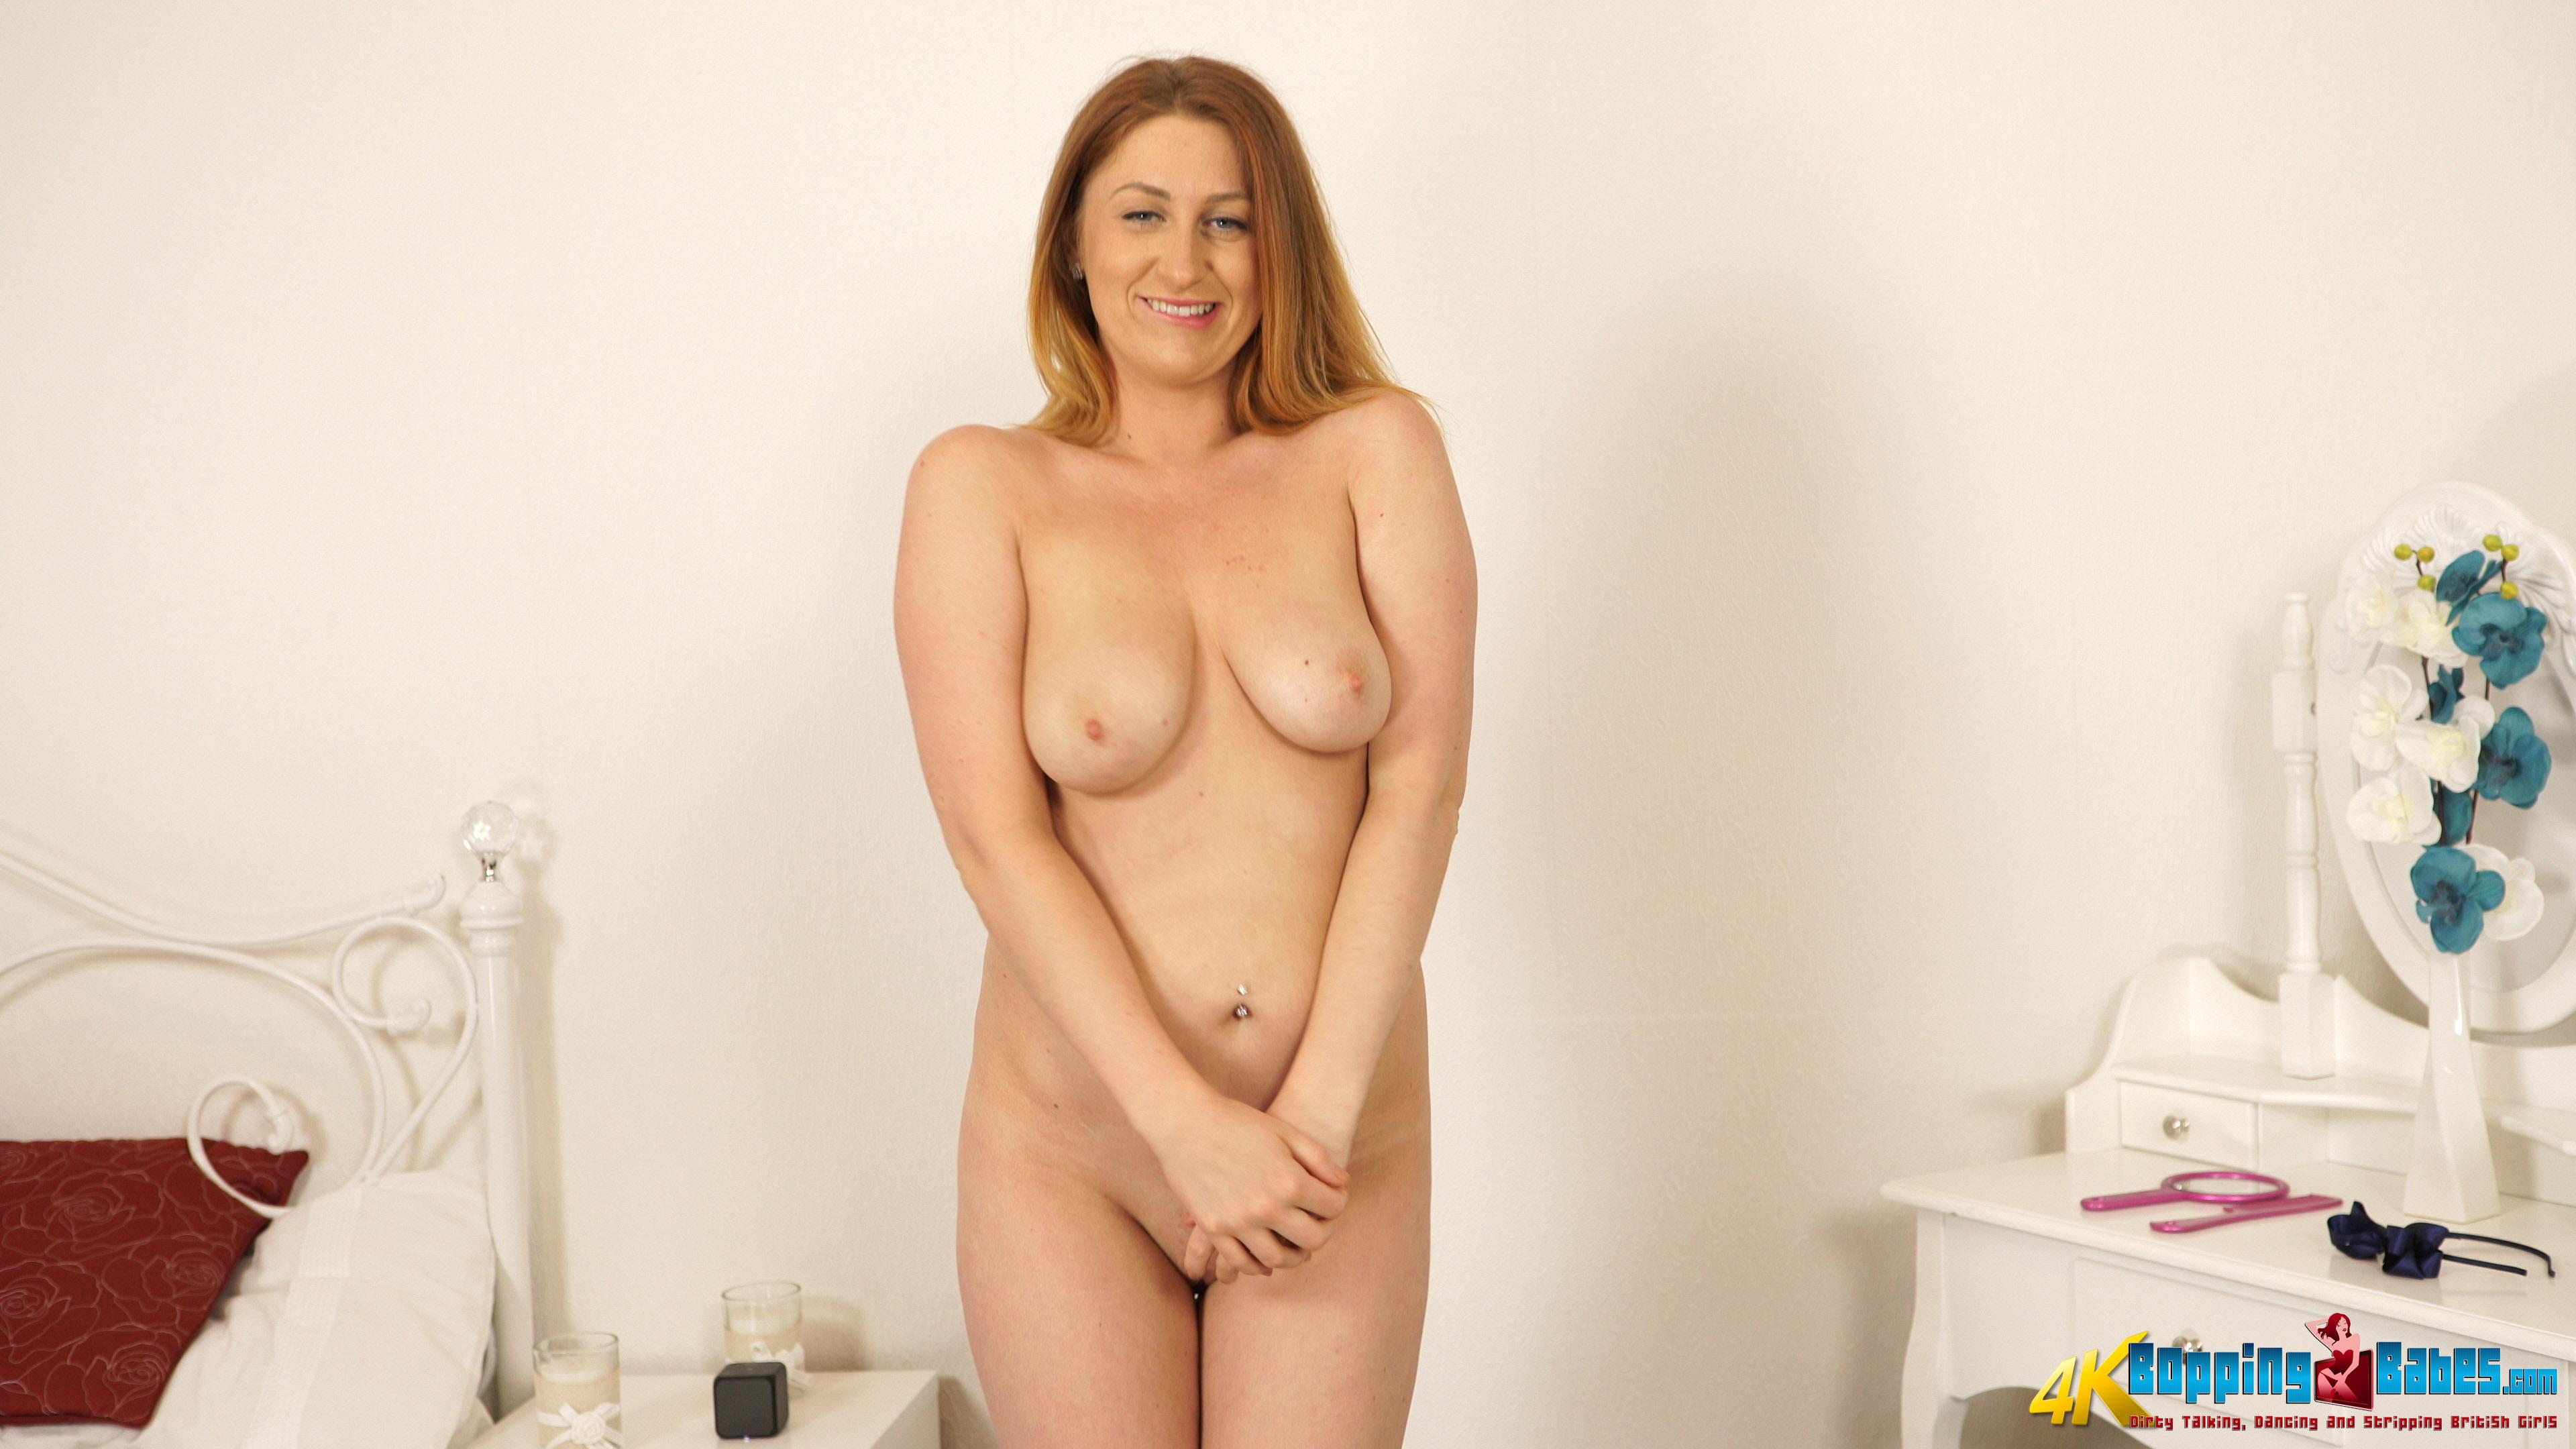 Dirty talking british slut fucked in car showroom 6